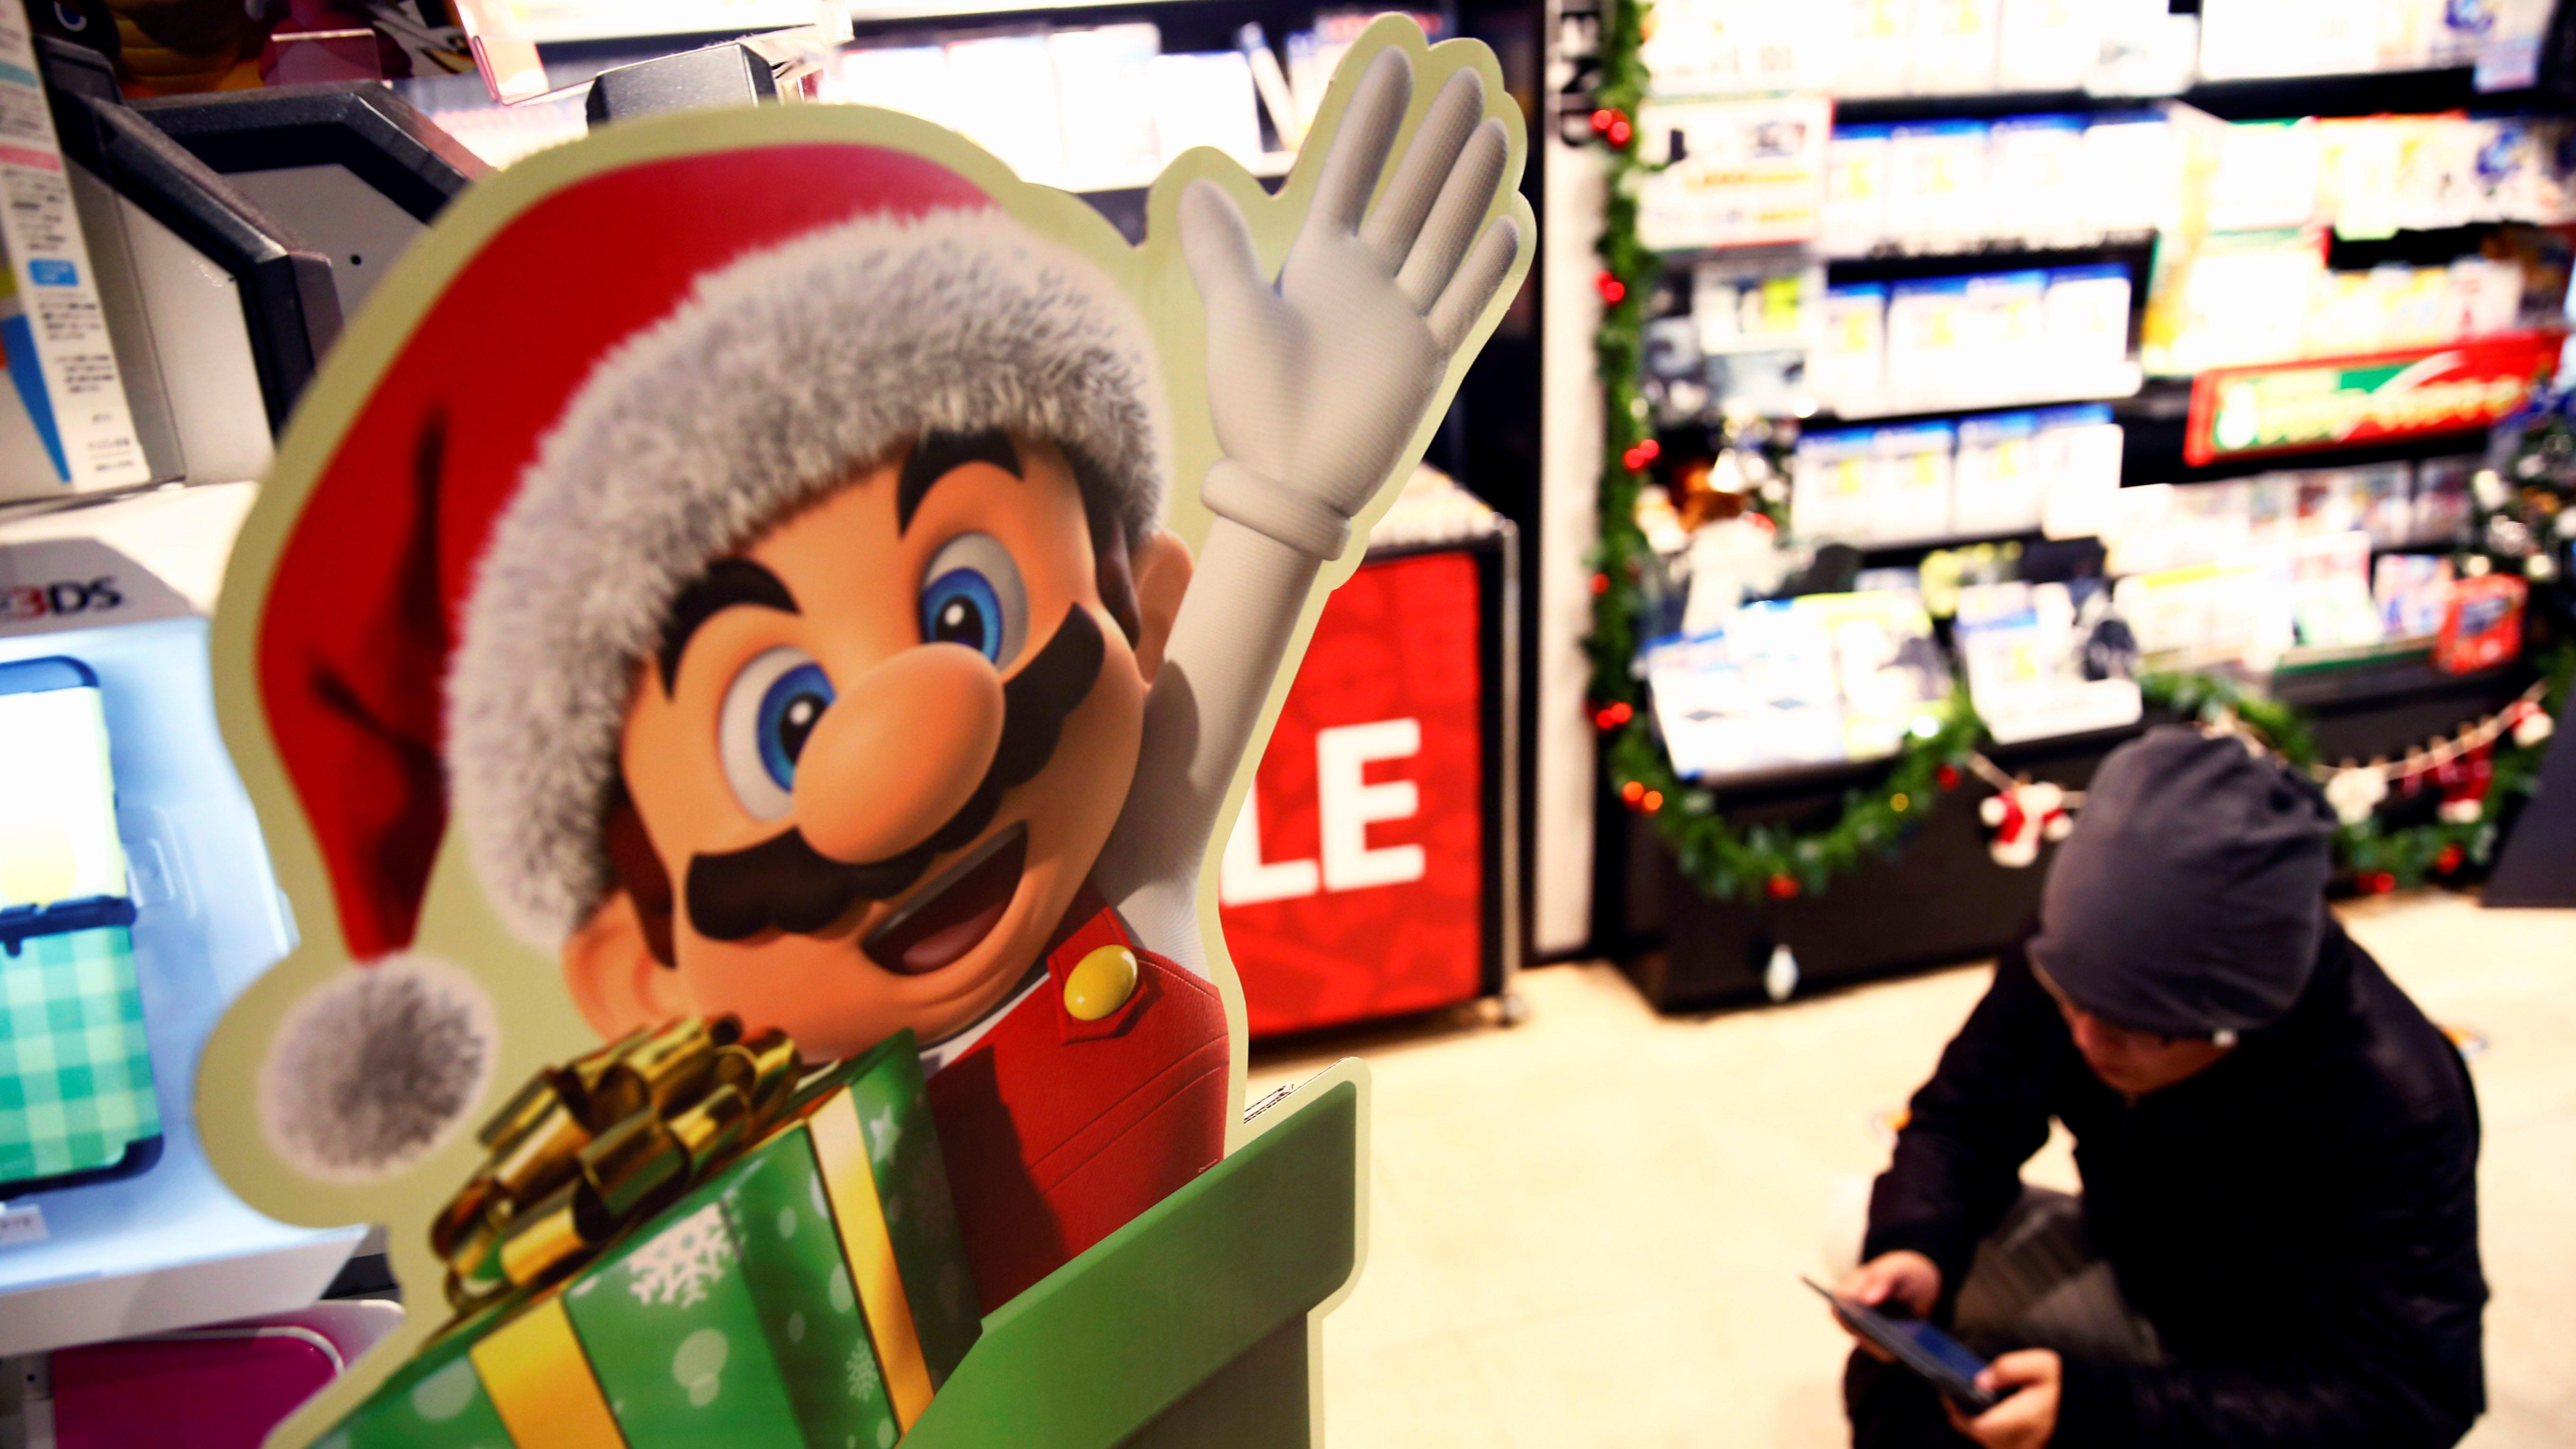 Nintendo's Super Mario game character is pictured at a video game corner of SHIBUYA TSUTAYA in Tokyo, Japan, December 21, 2016.